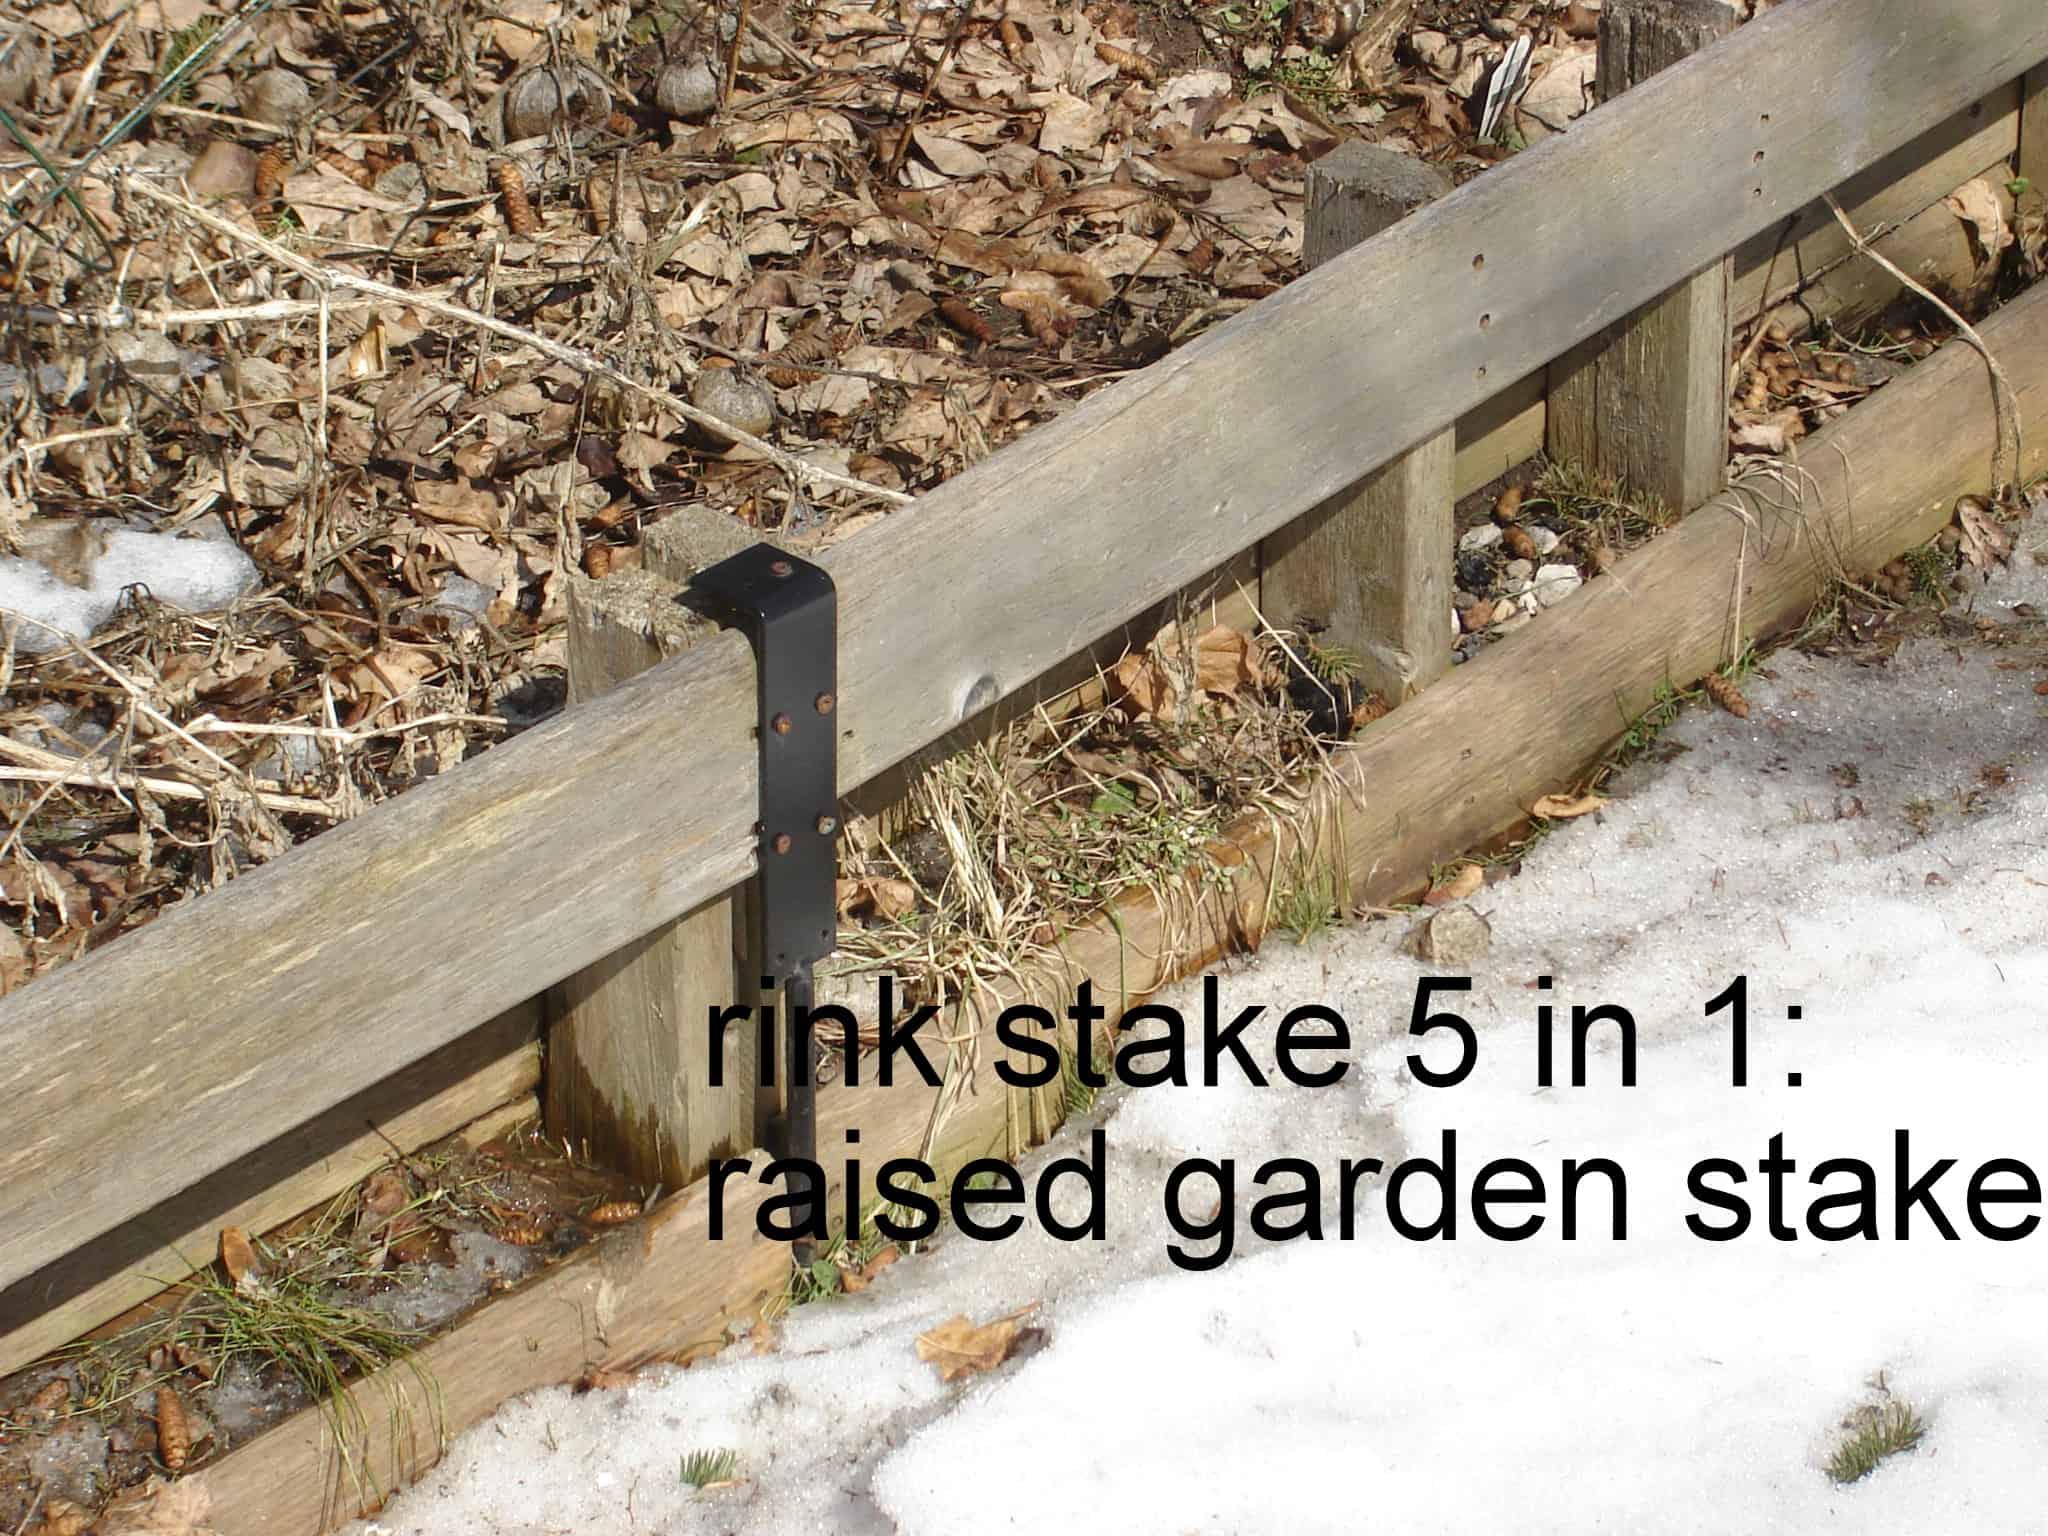 ice rink stake 5 in 1 6 presto install